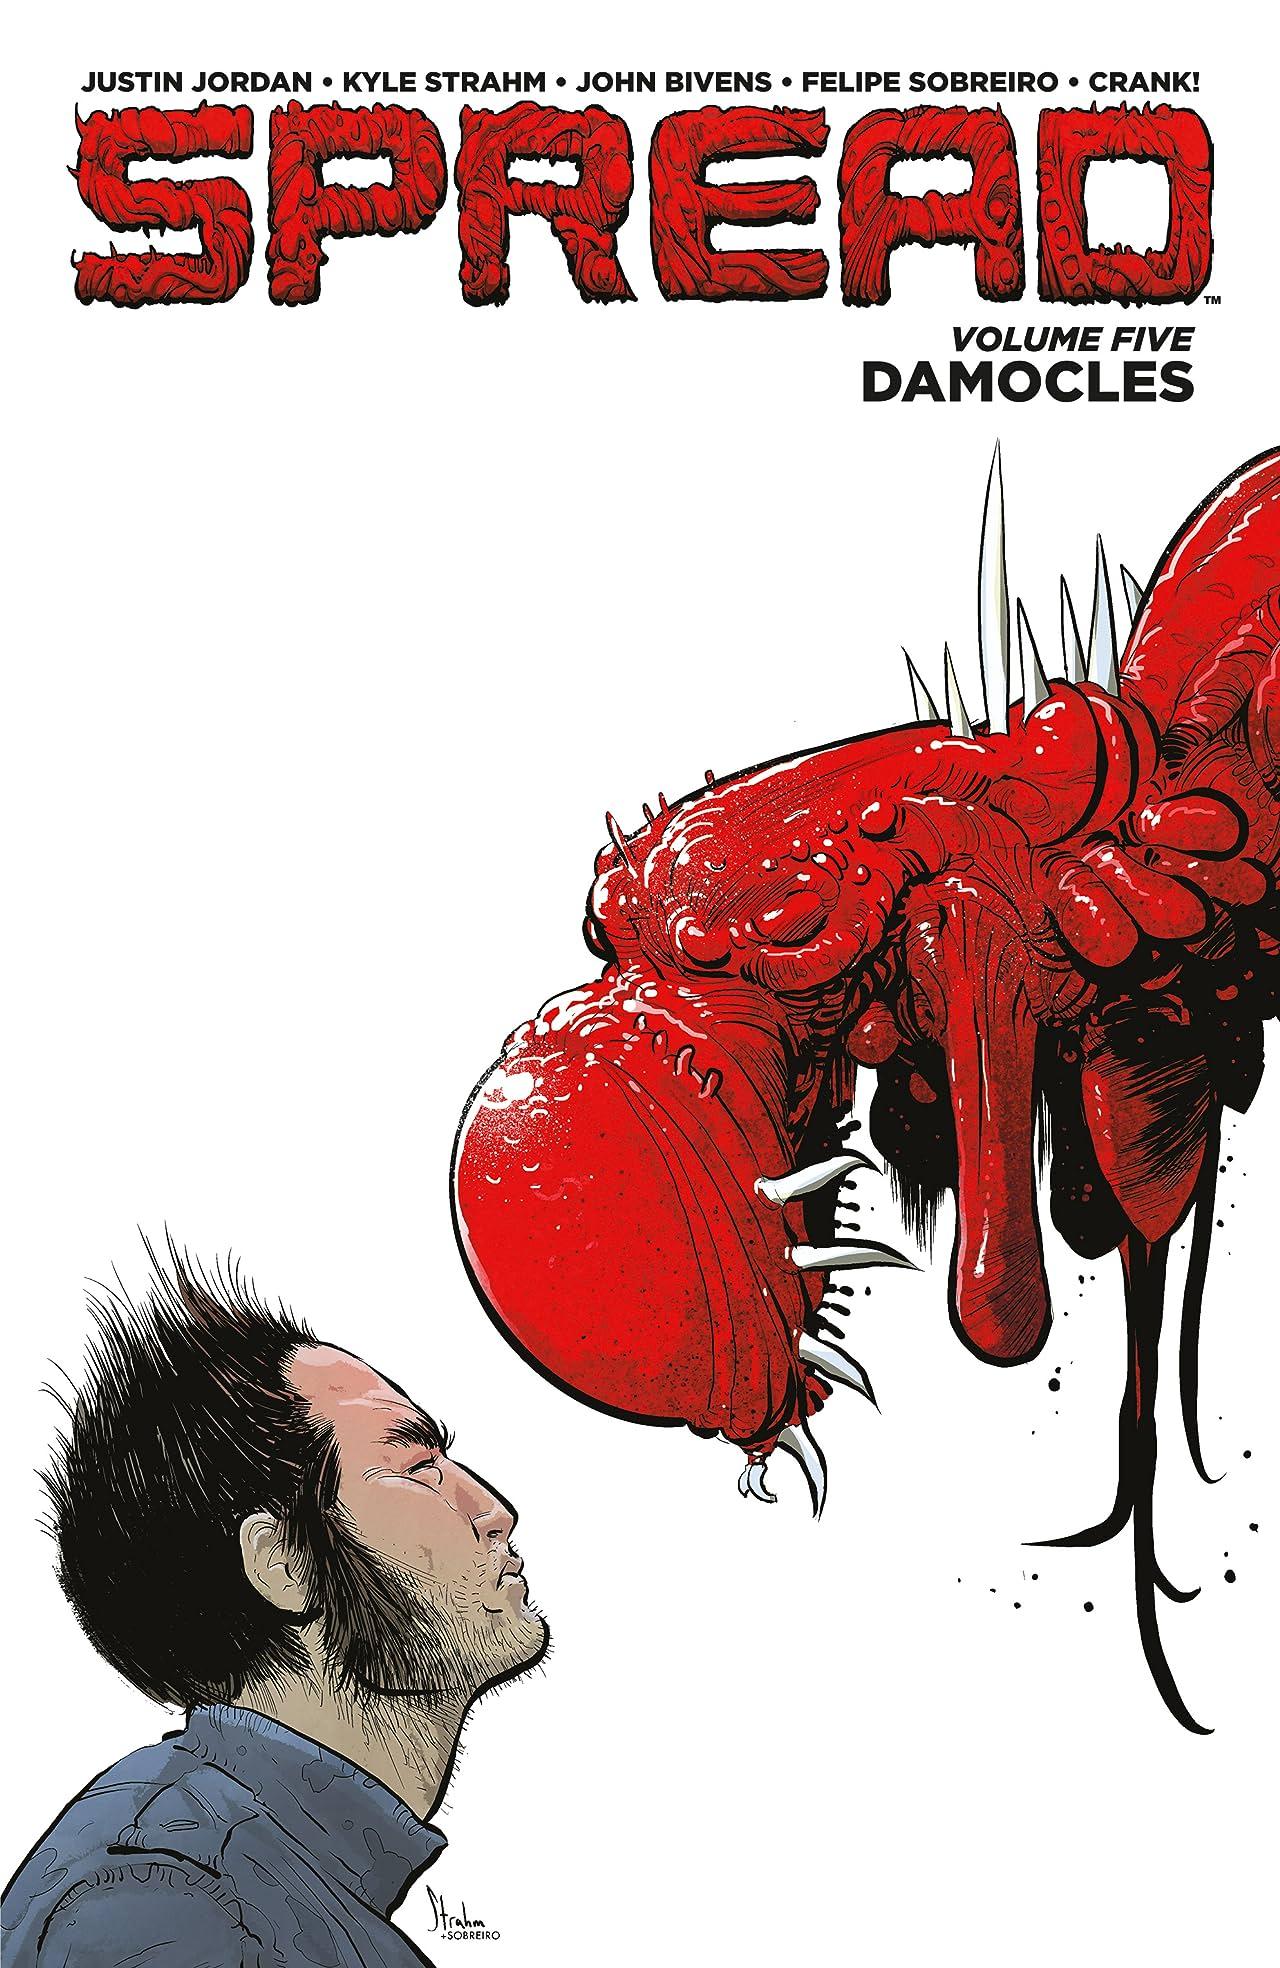 Spread Vol. 5: Damocles